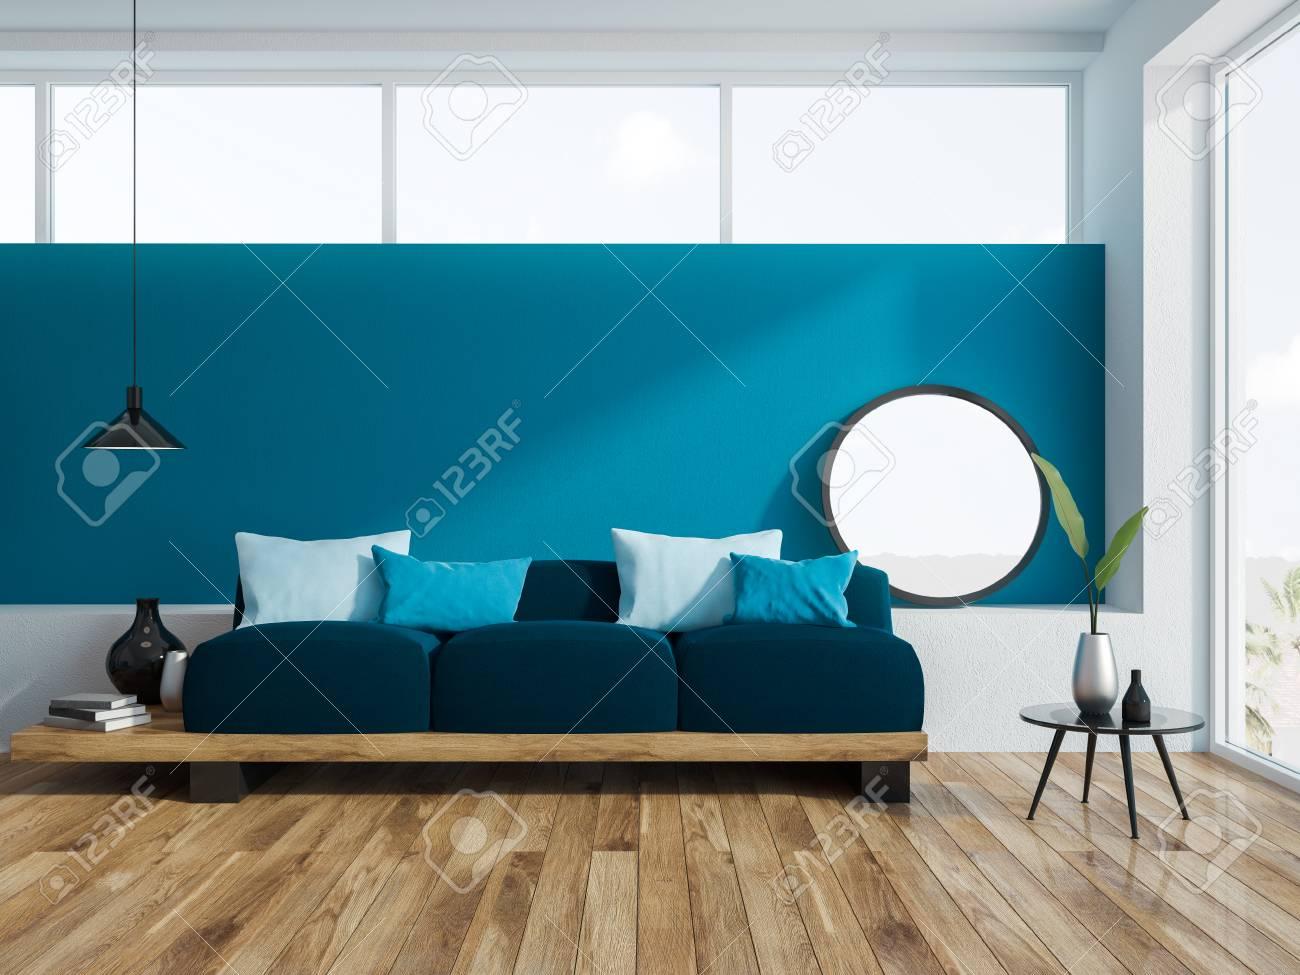 Awe Inspiring Blue Living Room Interior With A Wooden Floor A Loft Window Evergreenethics Interior Chair Design Evergreenethicsorg